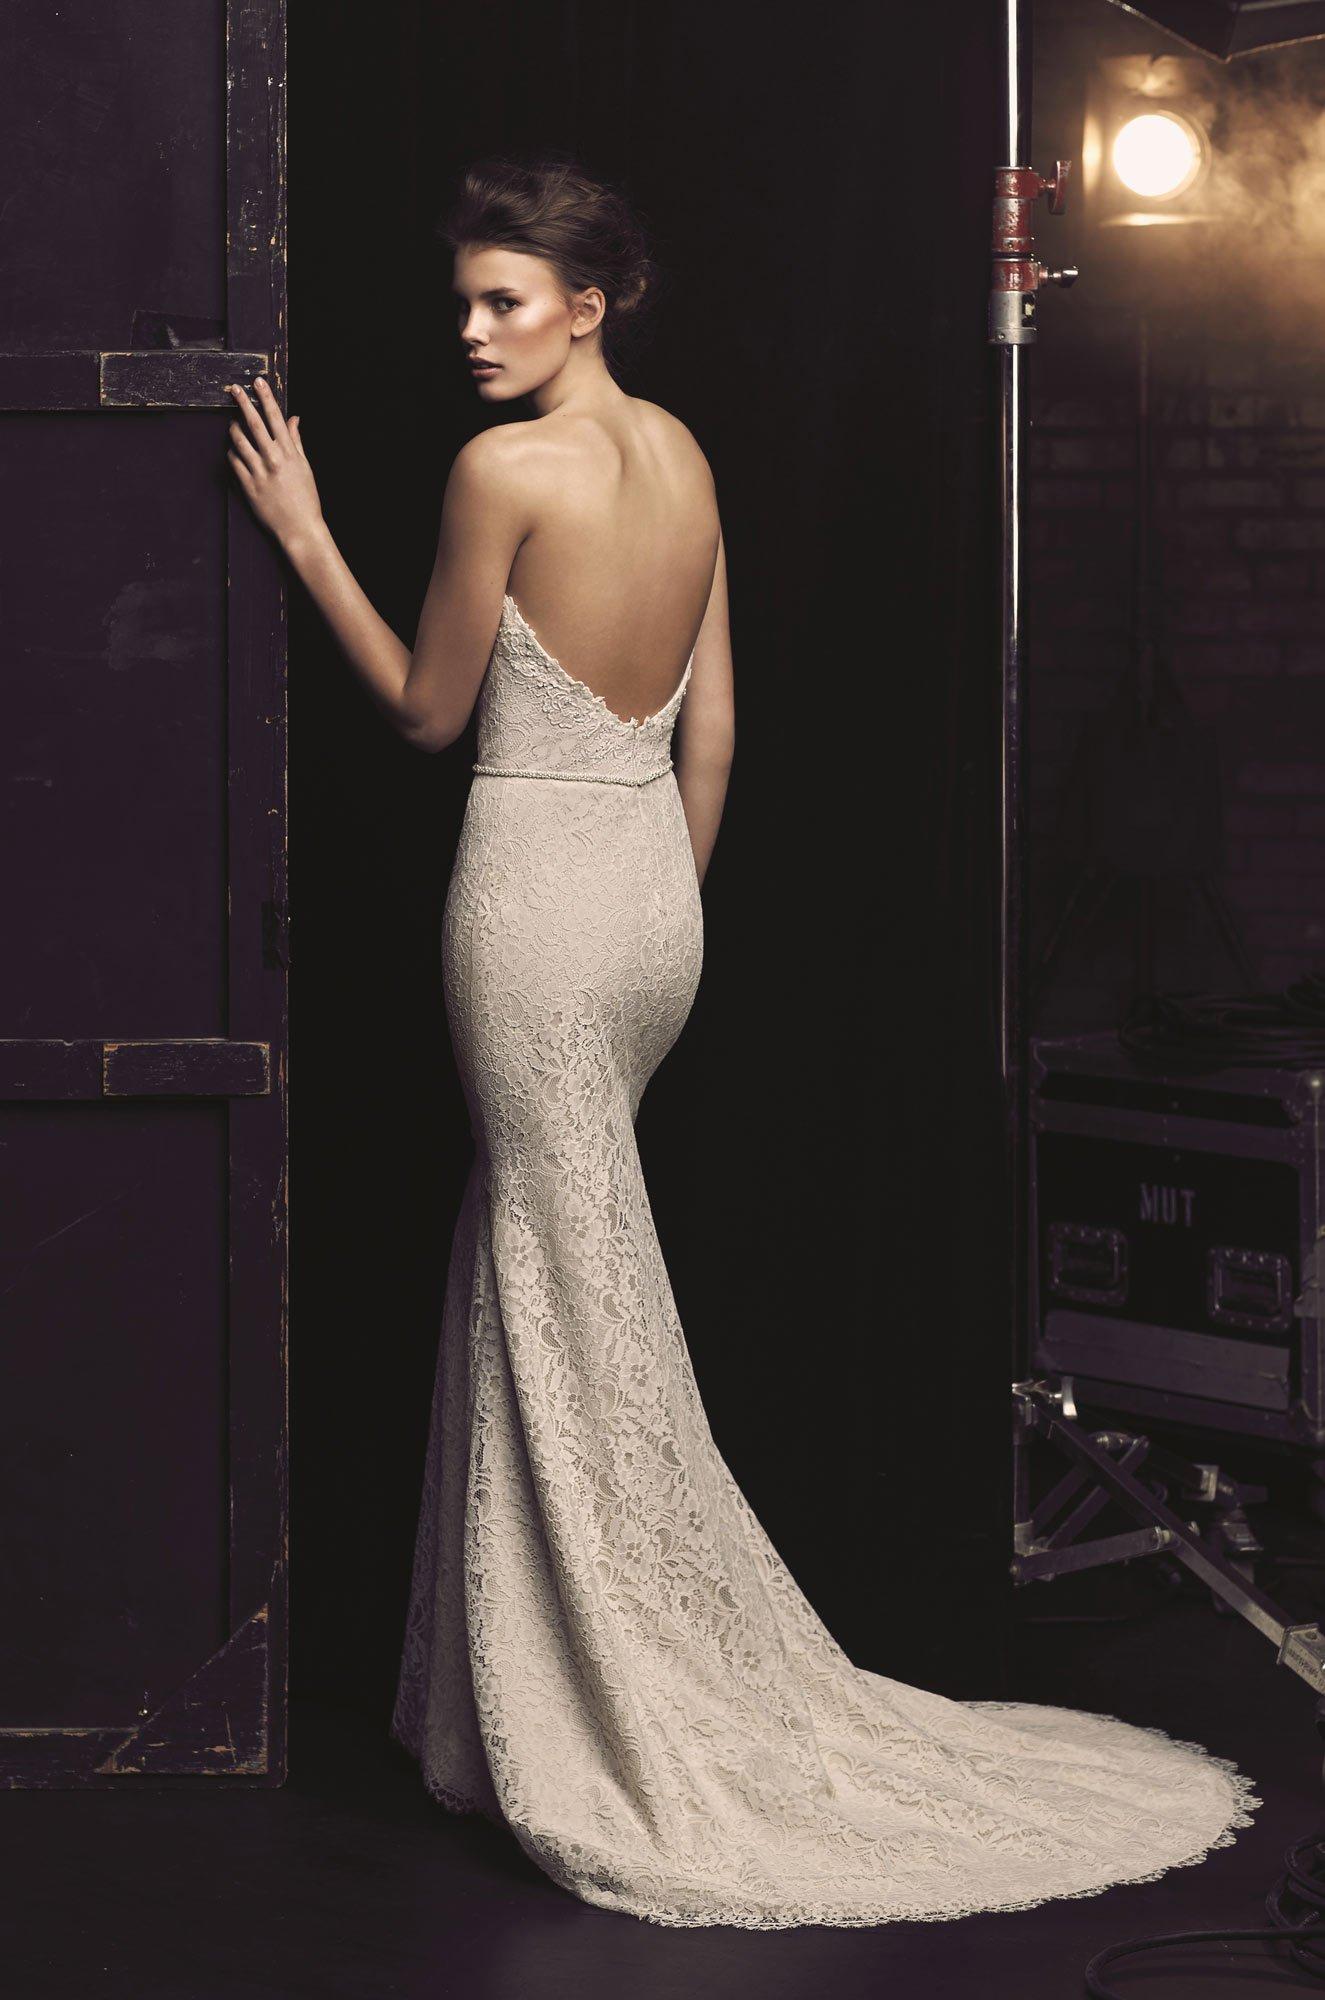 Plunging Neckline Wedding Dress - Style #2077 | Mikaella Bridal